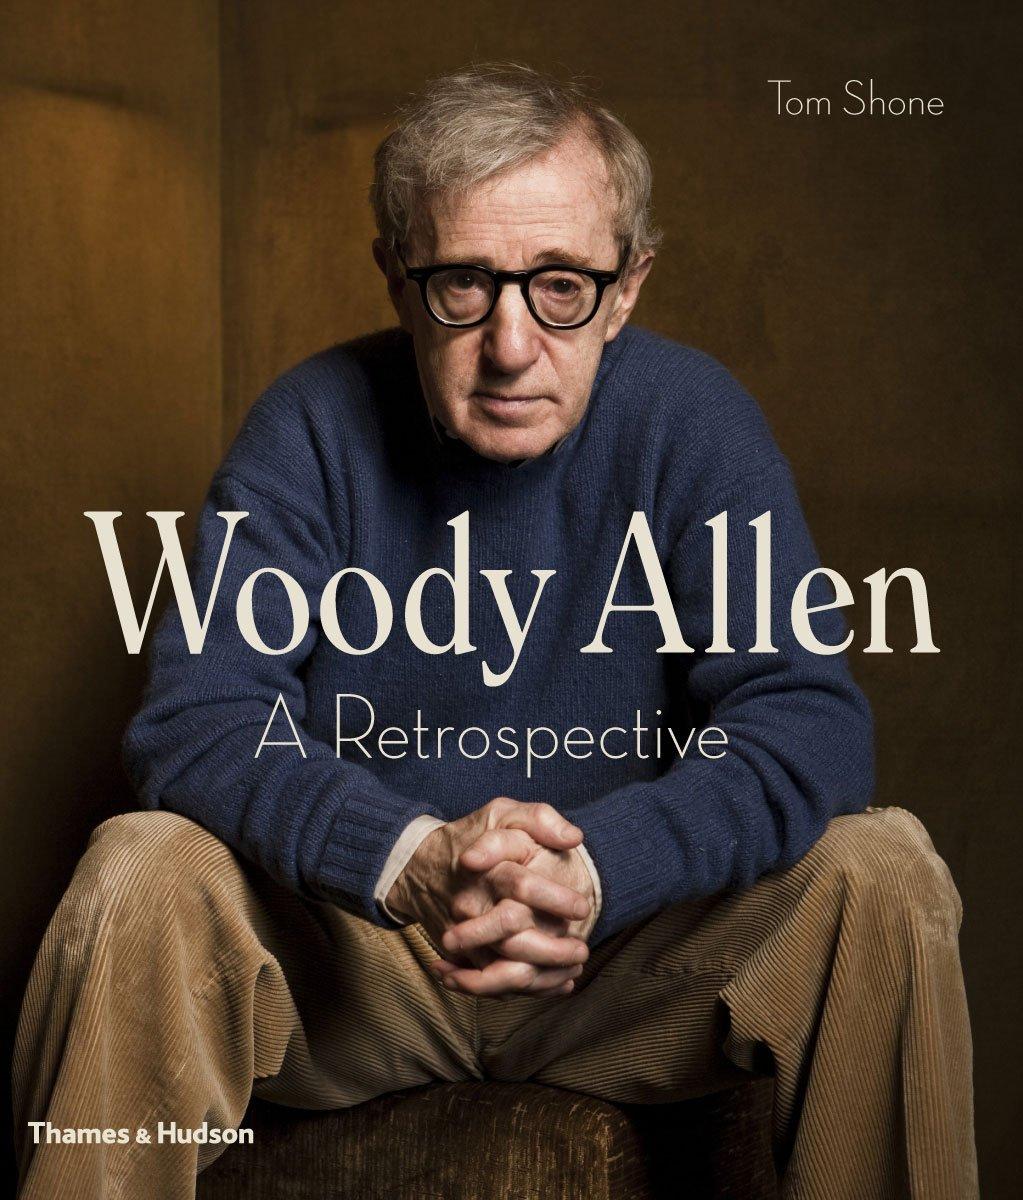 woody allen a retrospective co uk tom shone woody allen a retrospective co uk tom shone 9780500517987 books